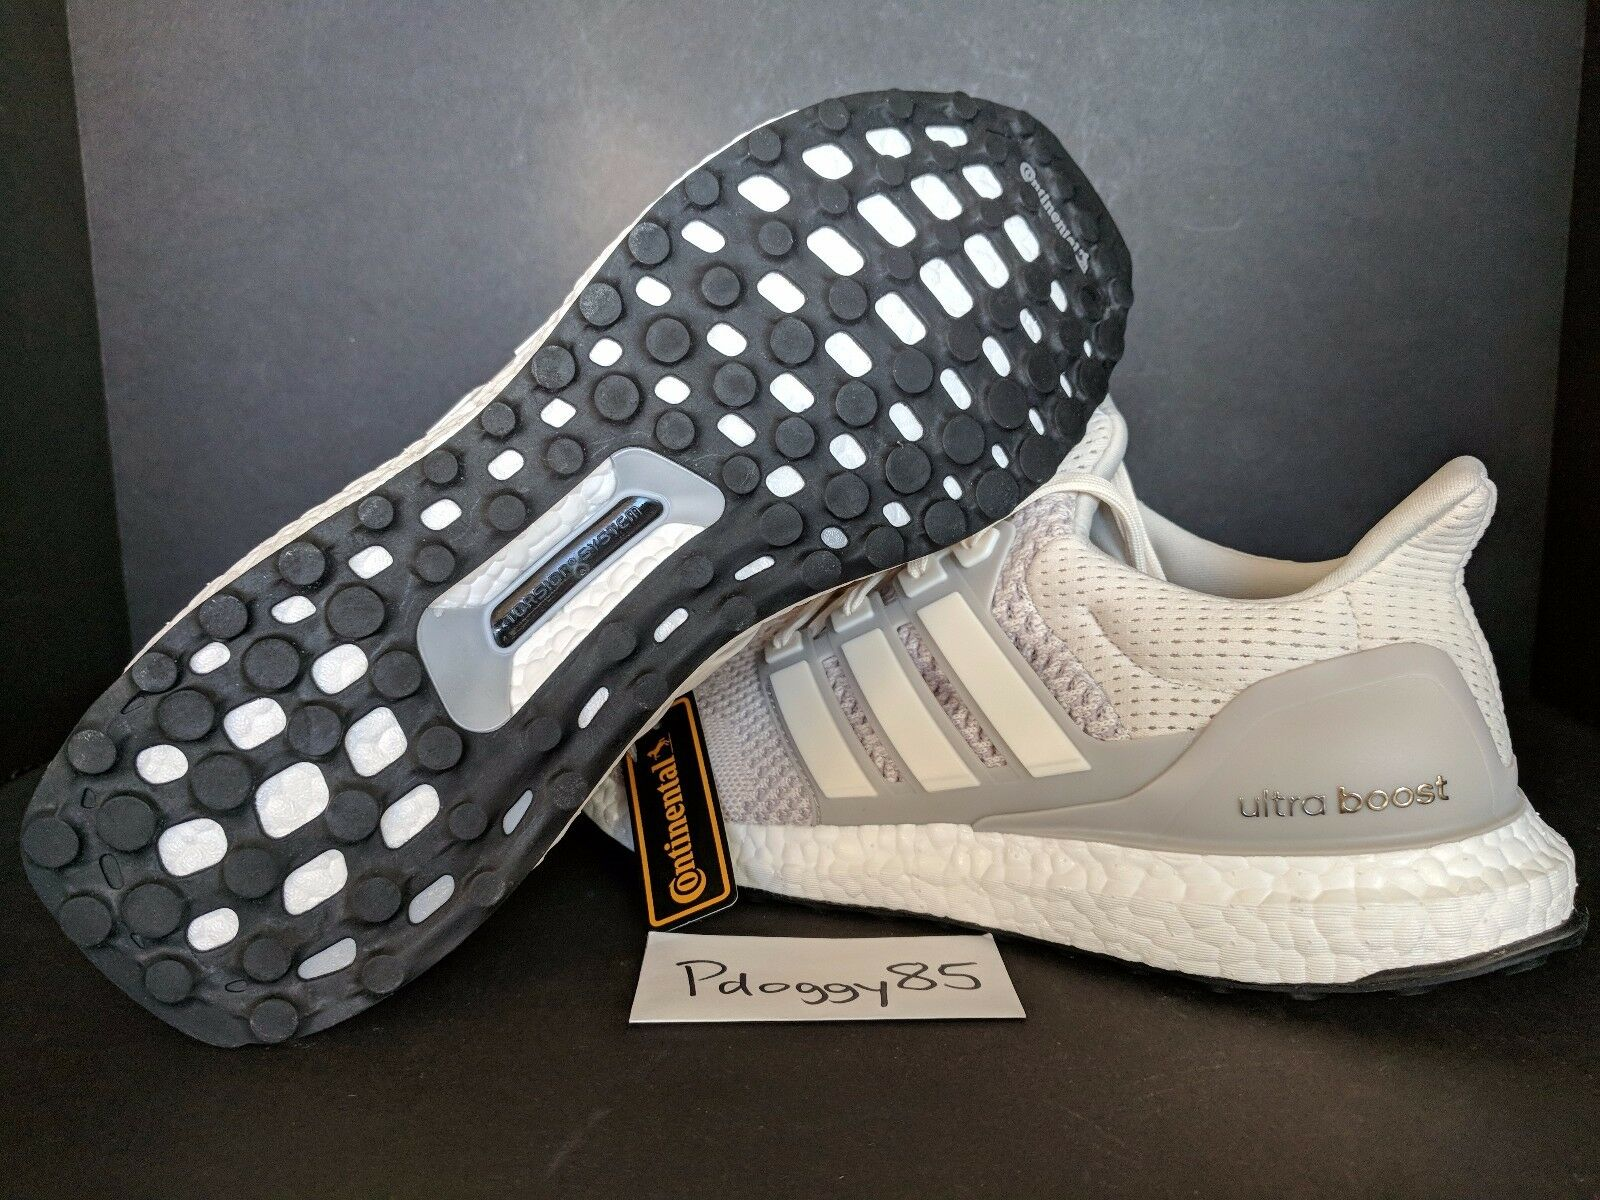 Ds adidas ultra auftrieb auftrieb auftrieb 1,0 größe 11 - kreide nmd sns holz hypebeast kith yeezy 481658